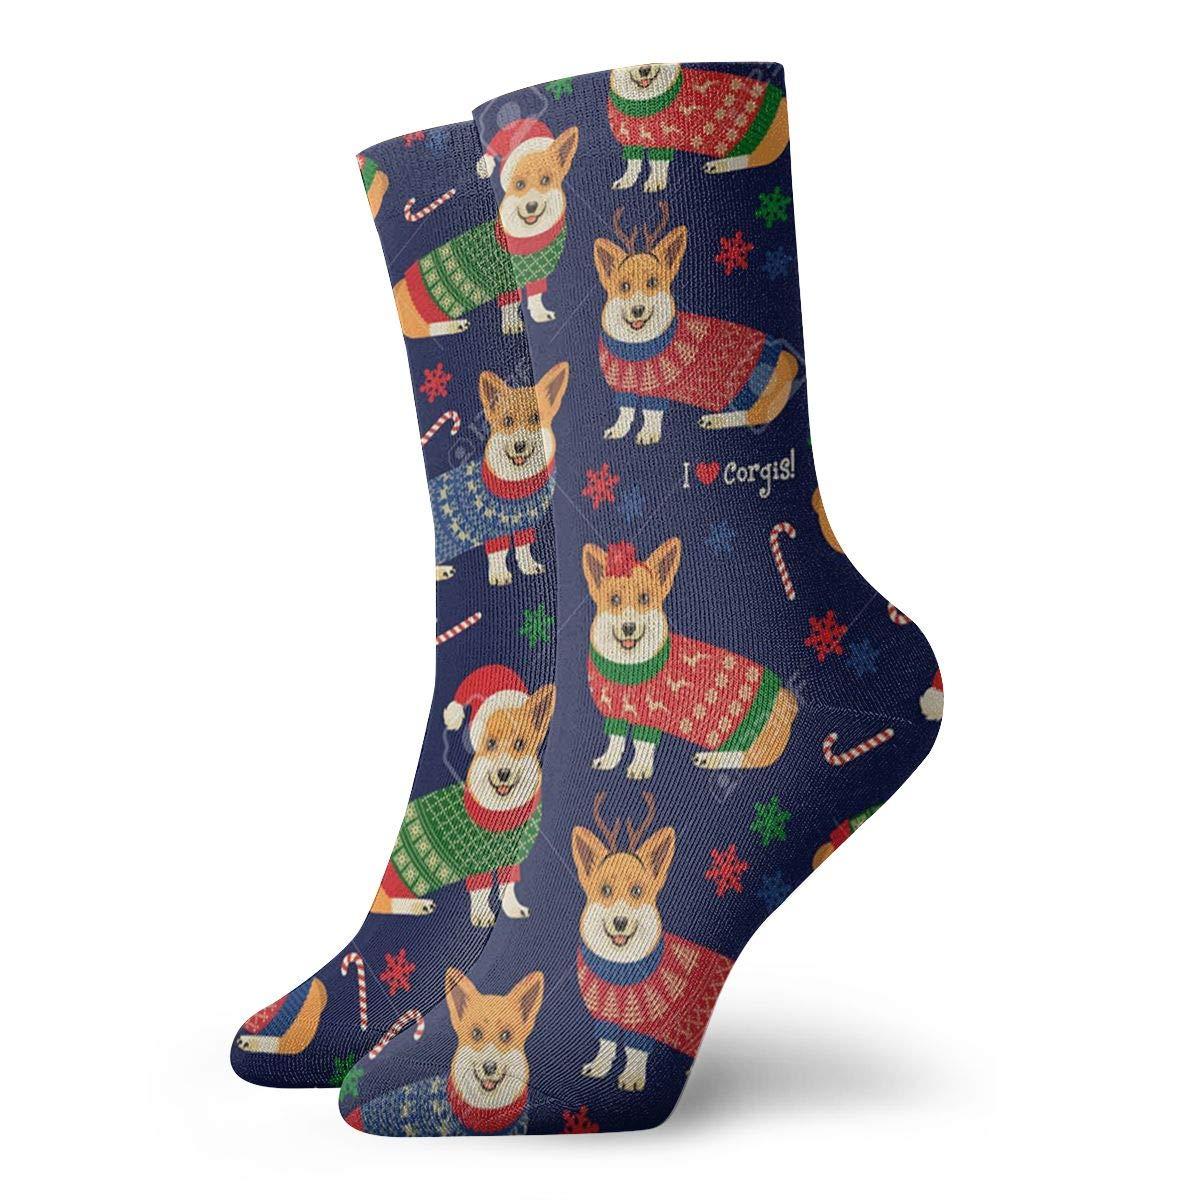 Christmas-pattern-corgis Unisex Funny Casual Crew Socks Athletic Socks For Boys Girls Kids Teenagers